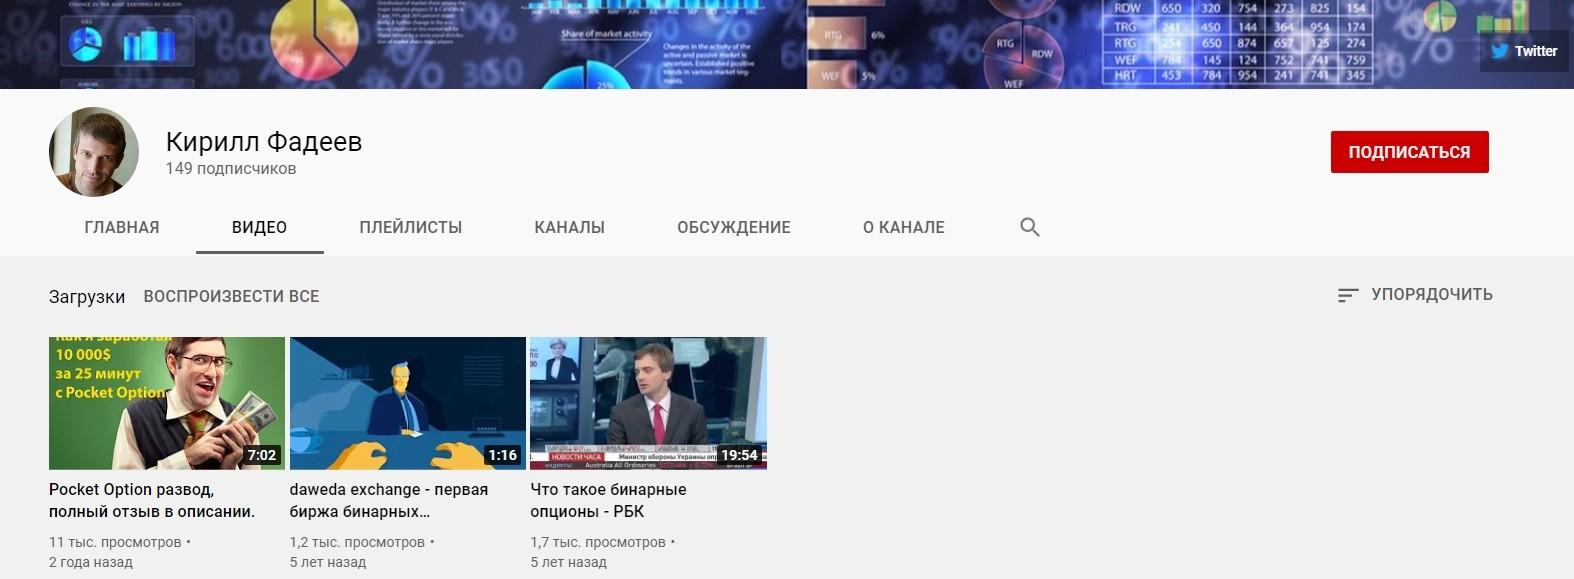 Ютуб канал Кирилла Фадеева